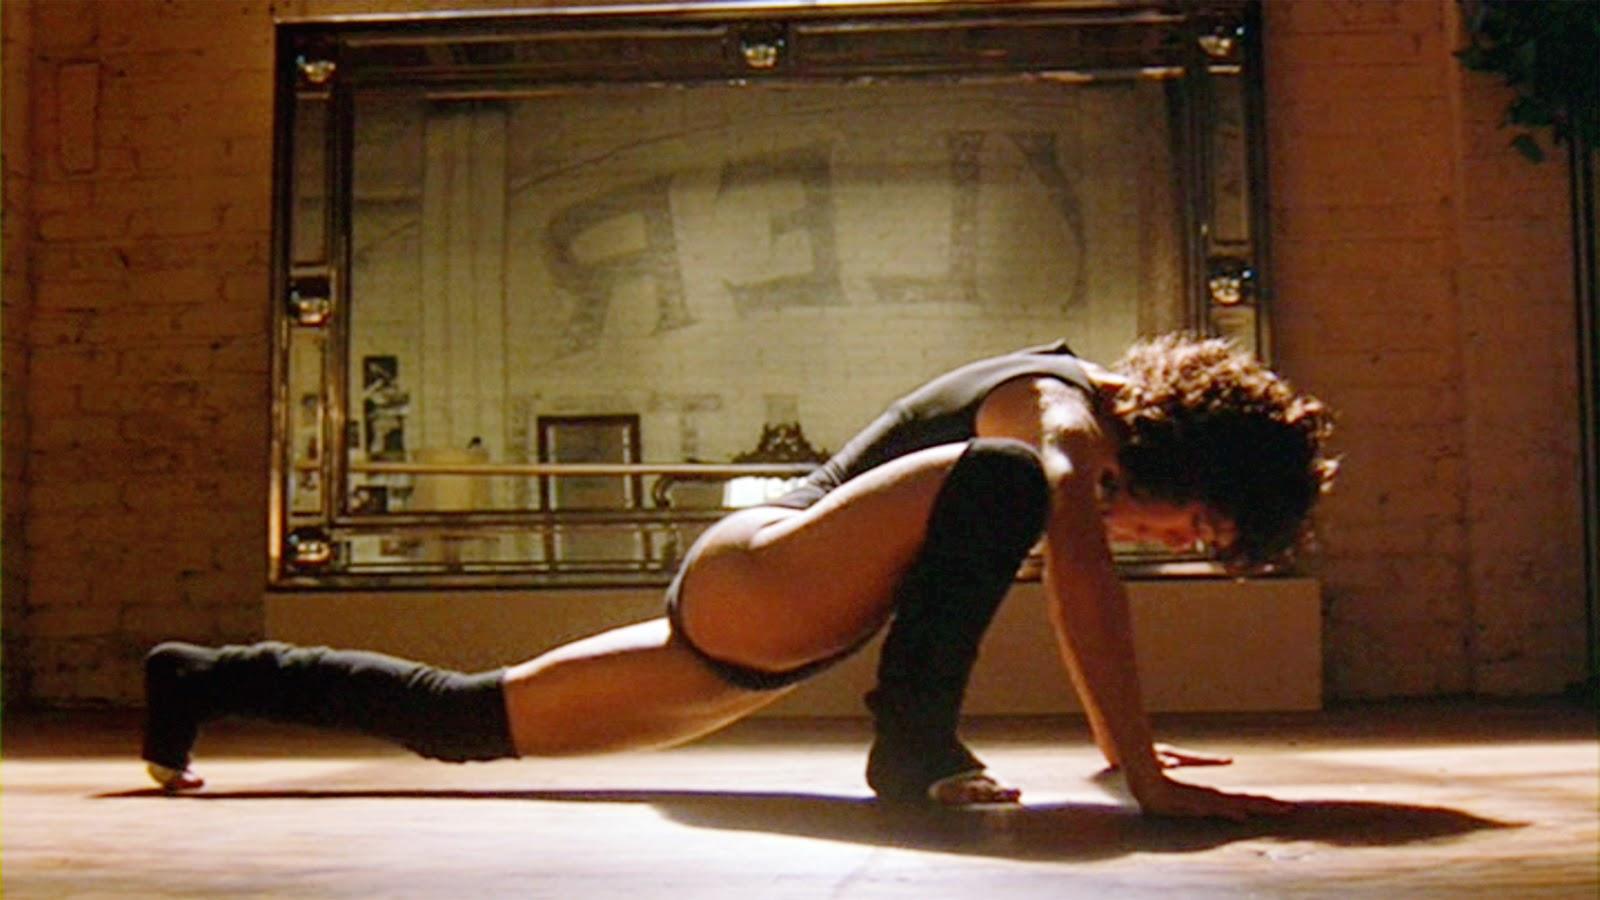 protagonista flashdance oggi